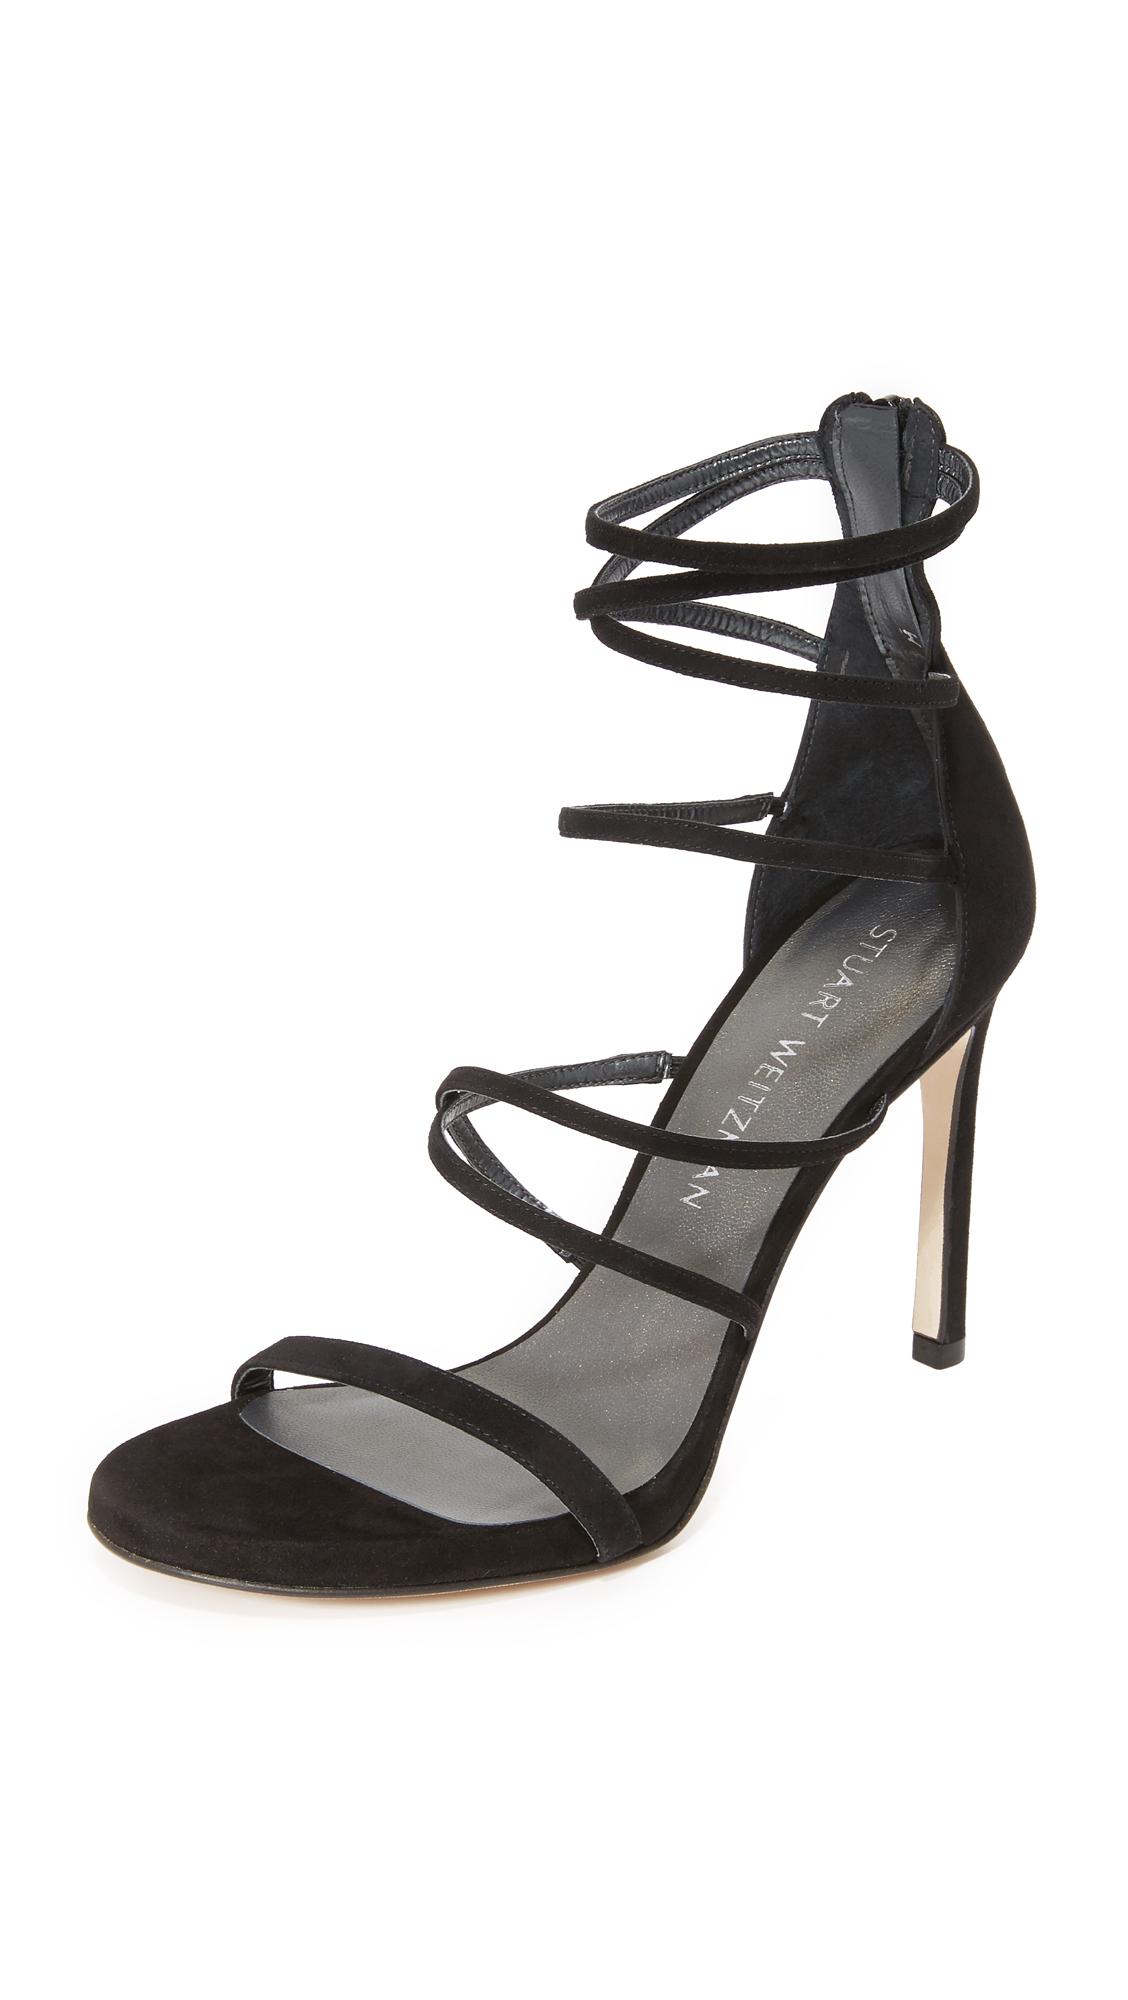 stuart weitzman female 188971 stuart weitzman myex sandals black